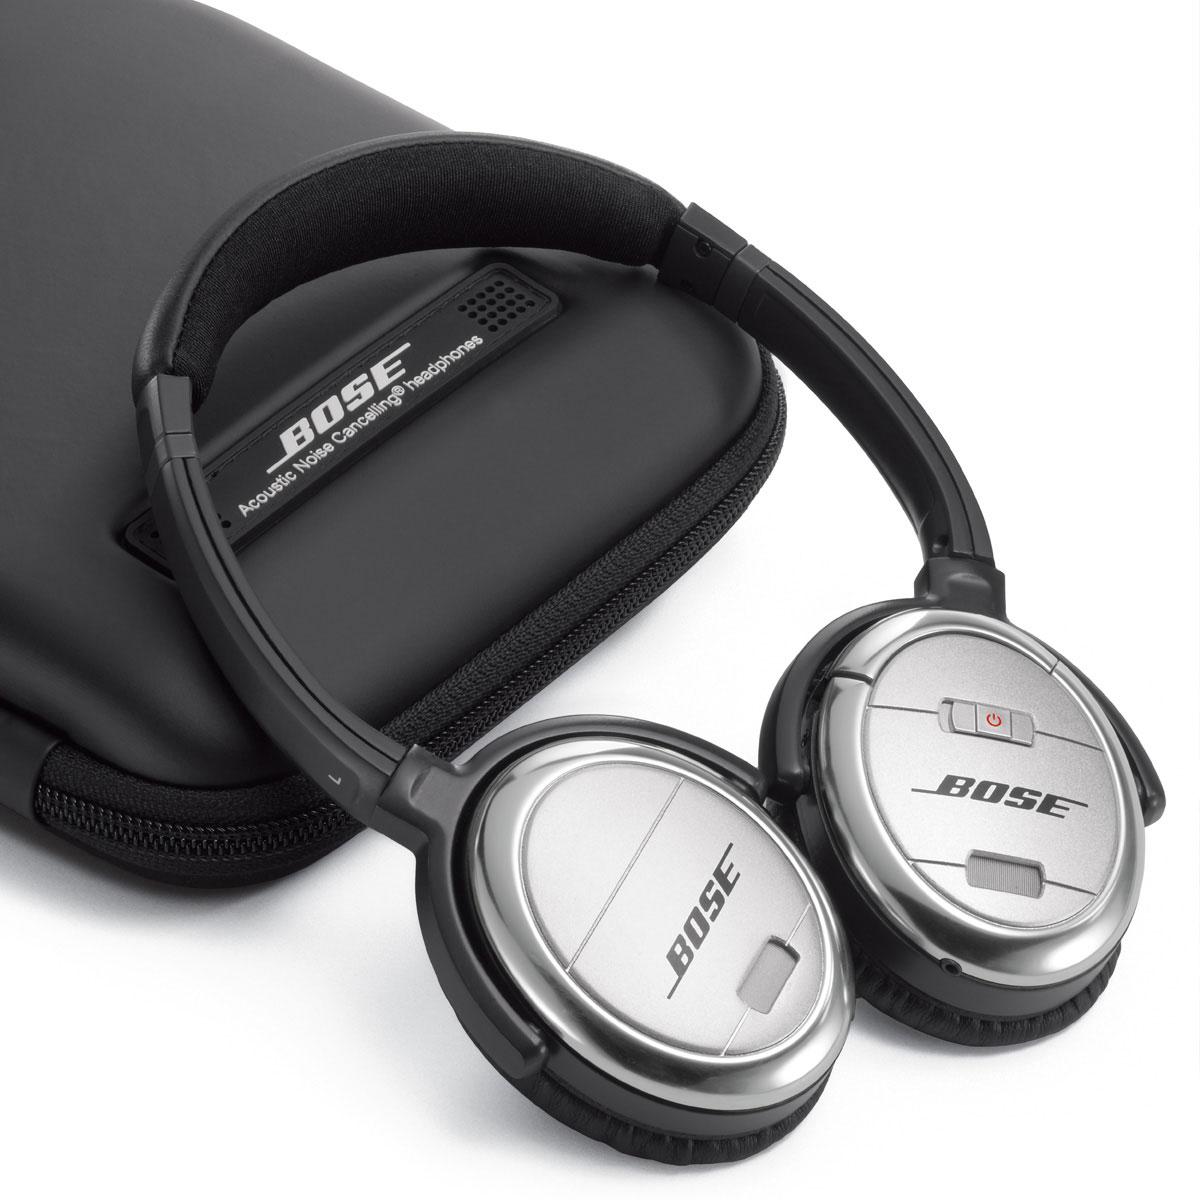 bose quietcomfort 3 headphones. Black Bedroom Furniture Sets. Home Design Ideas